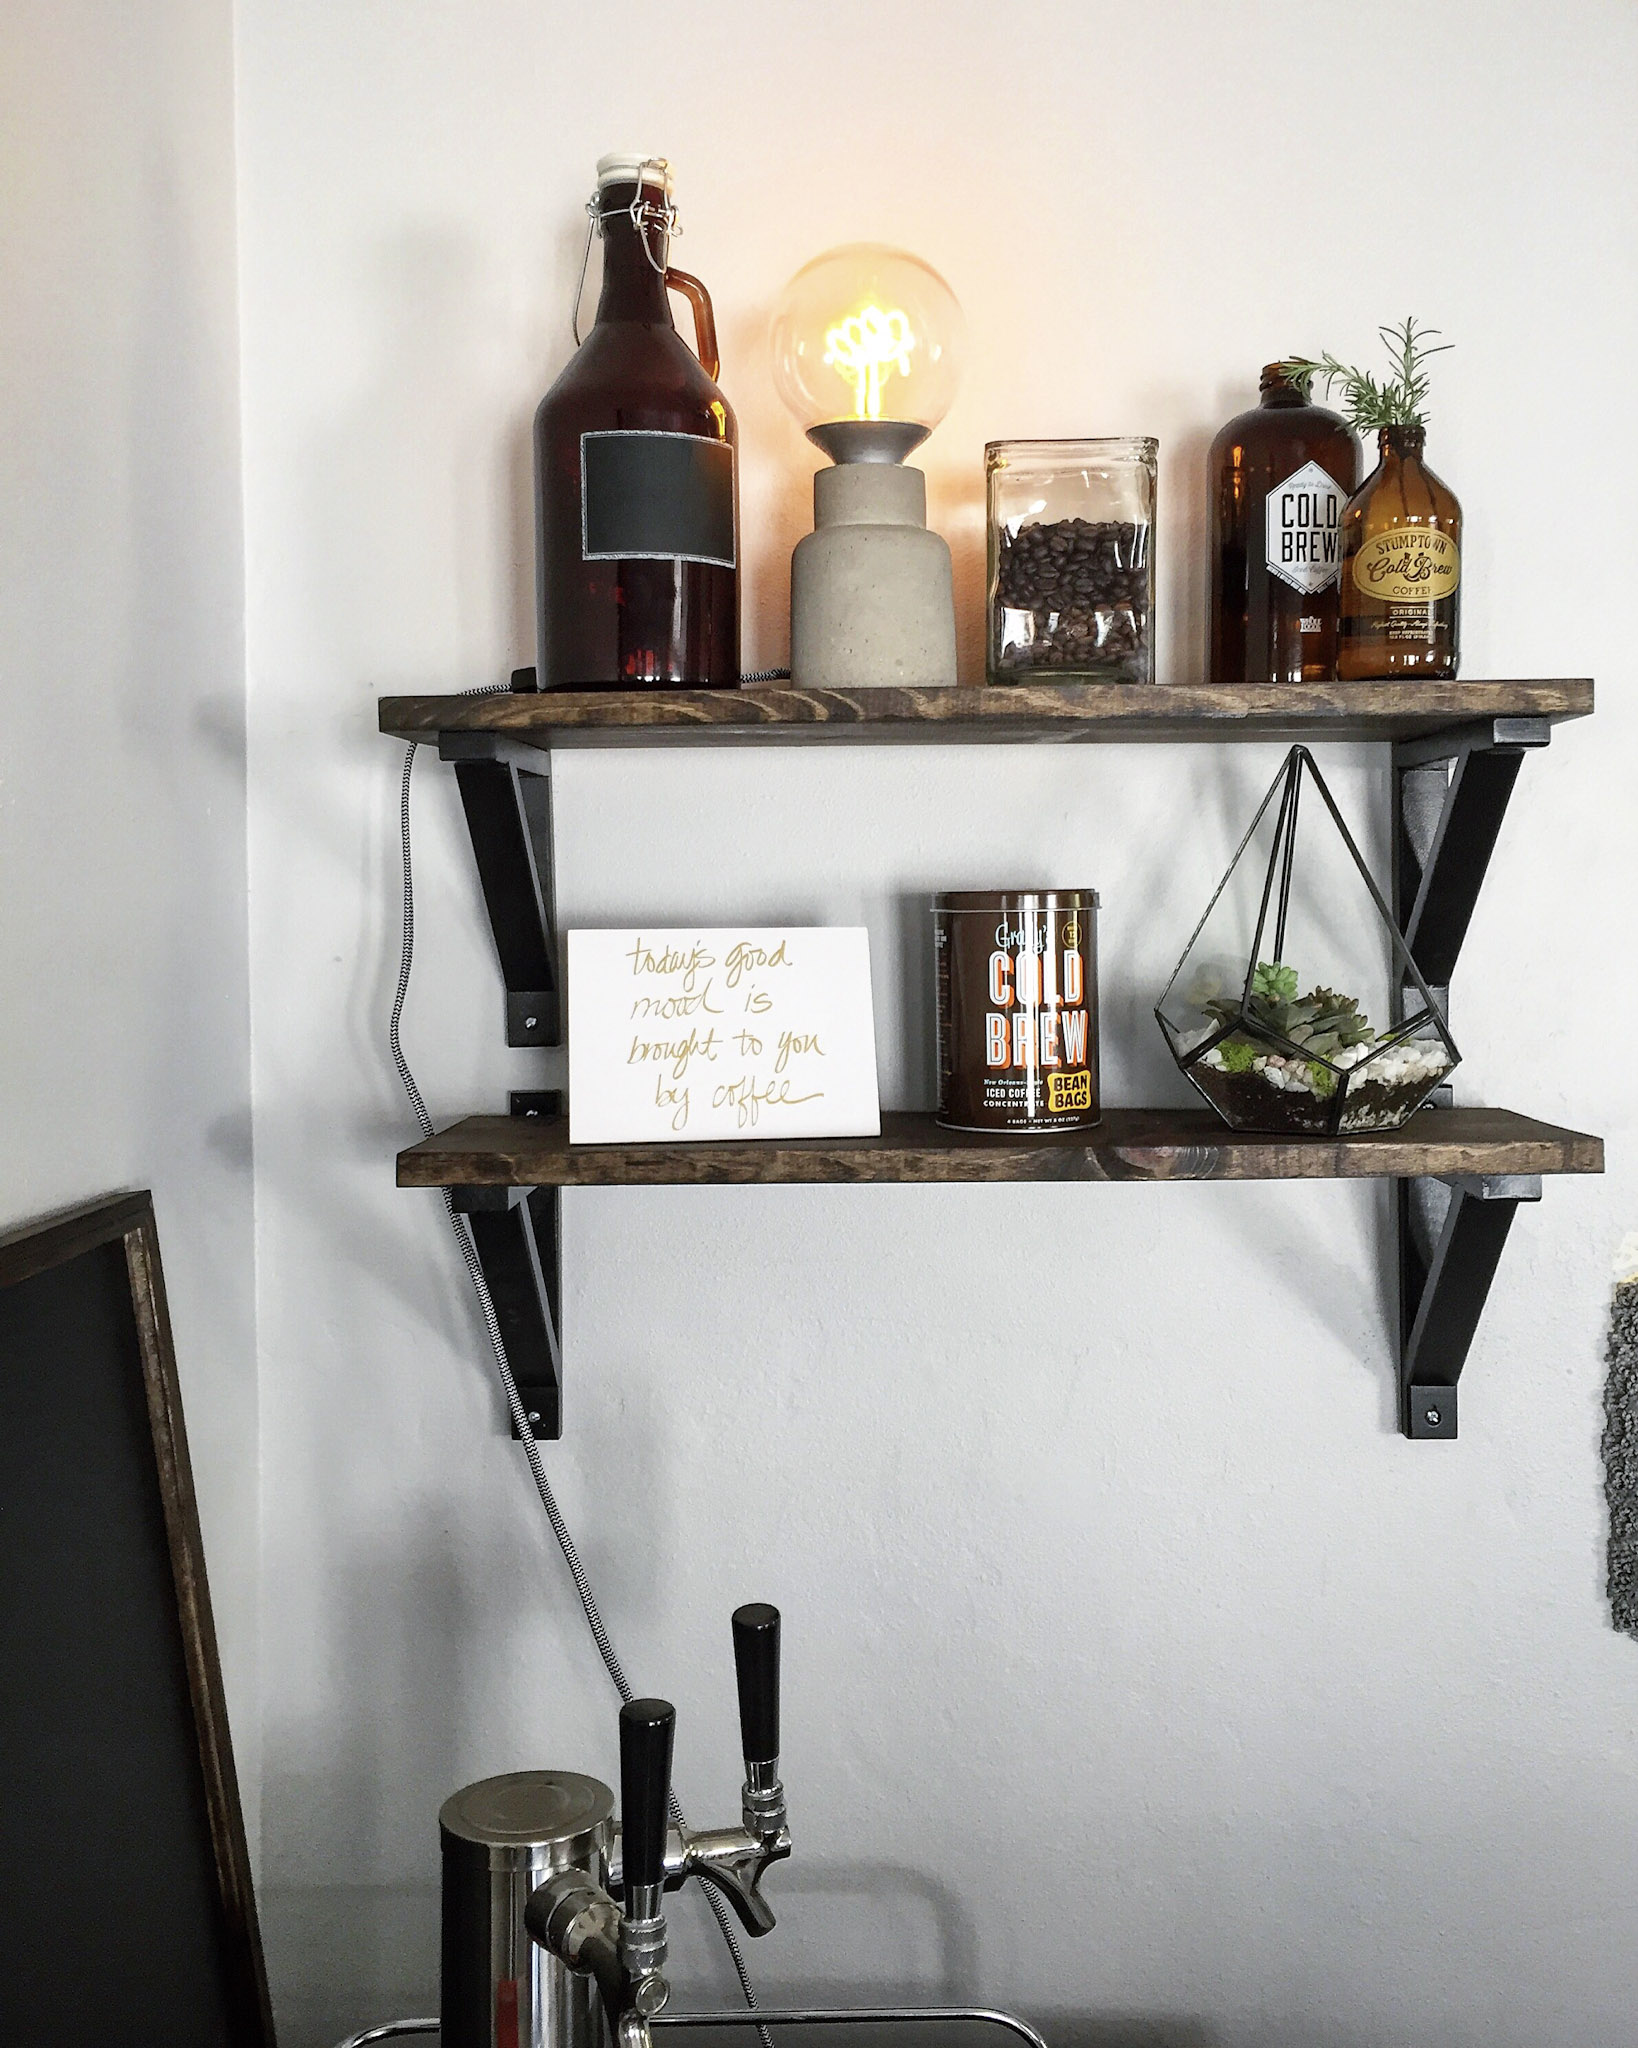 DIY Industrial Shelves (IKEA Hack) - Mince Republic